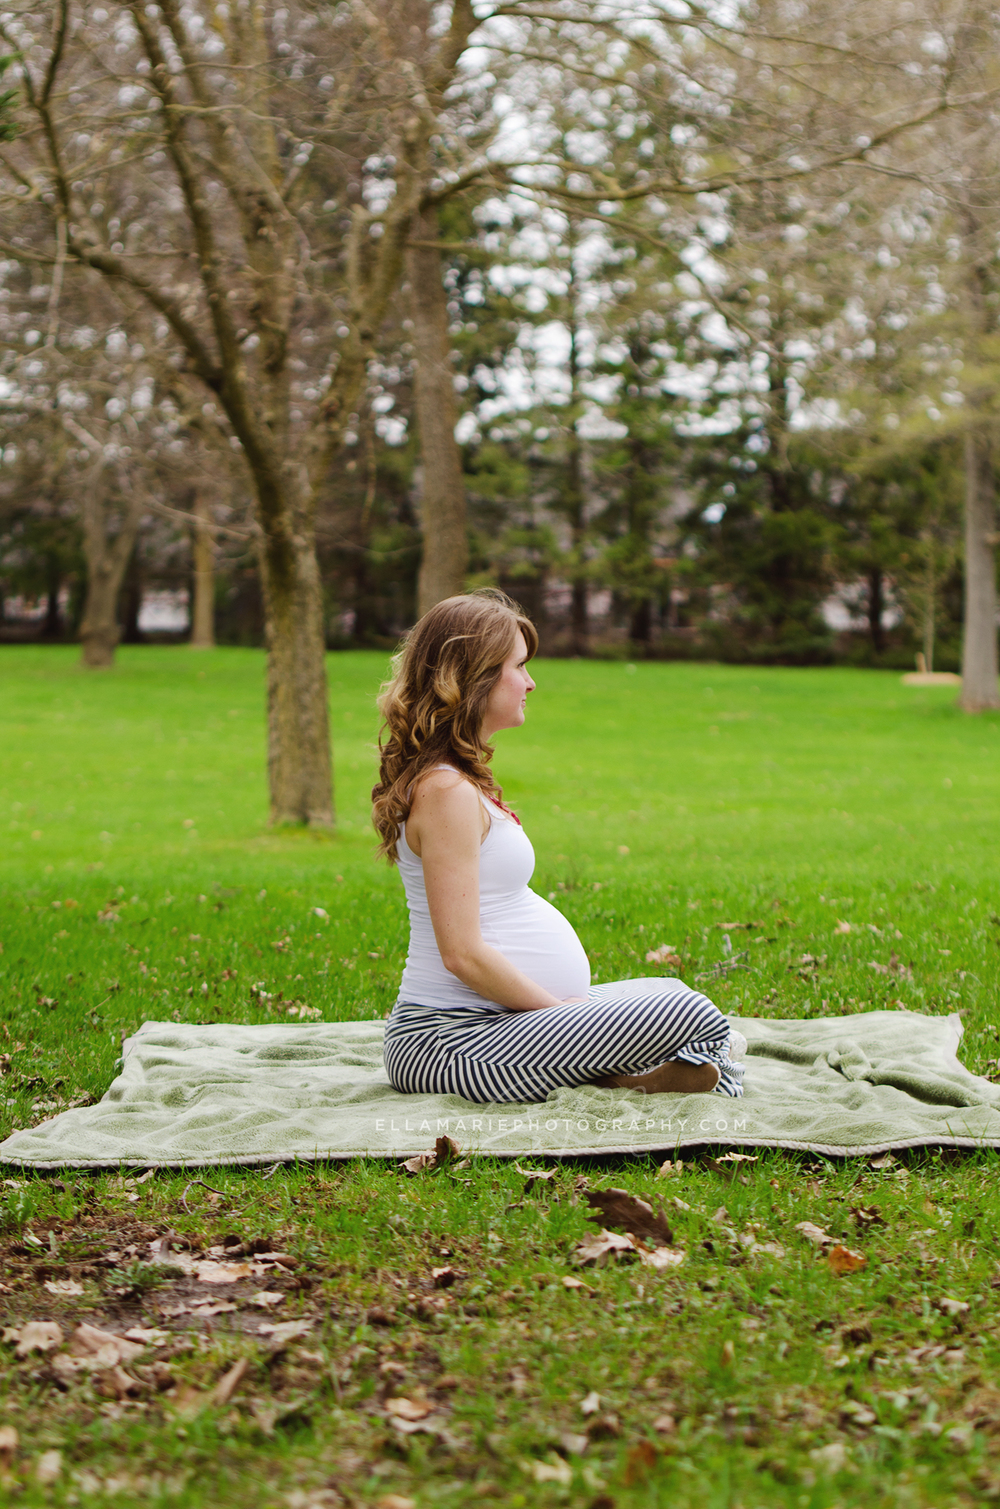 EllaMariePhotography_maternity_baby_infant_Baden_ON_New_Hamburg_Stratford_Waterloo_Kitchener_Guelph_Cambridge_Listowel_photographer_photography_14.jpg